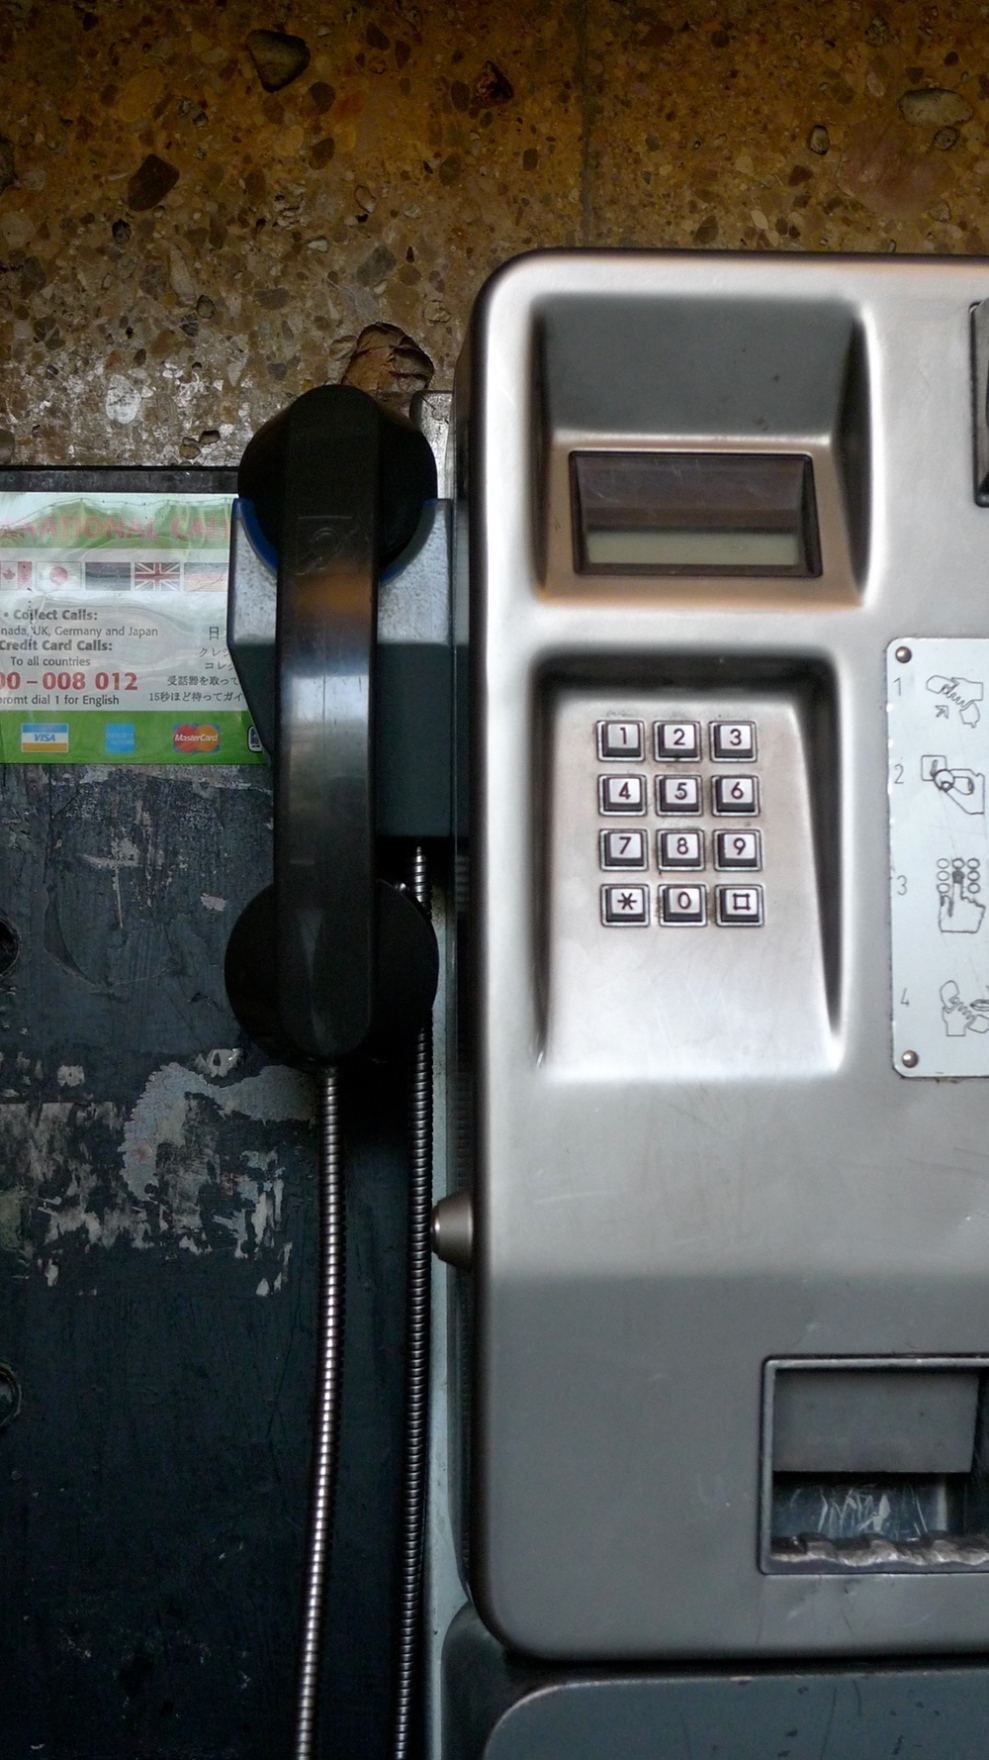 telephonelll